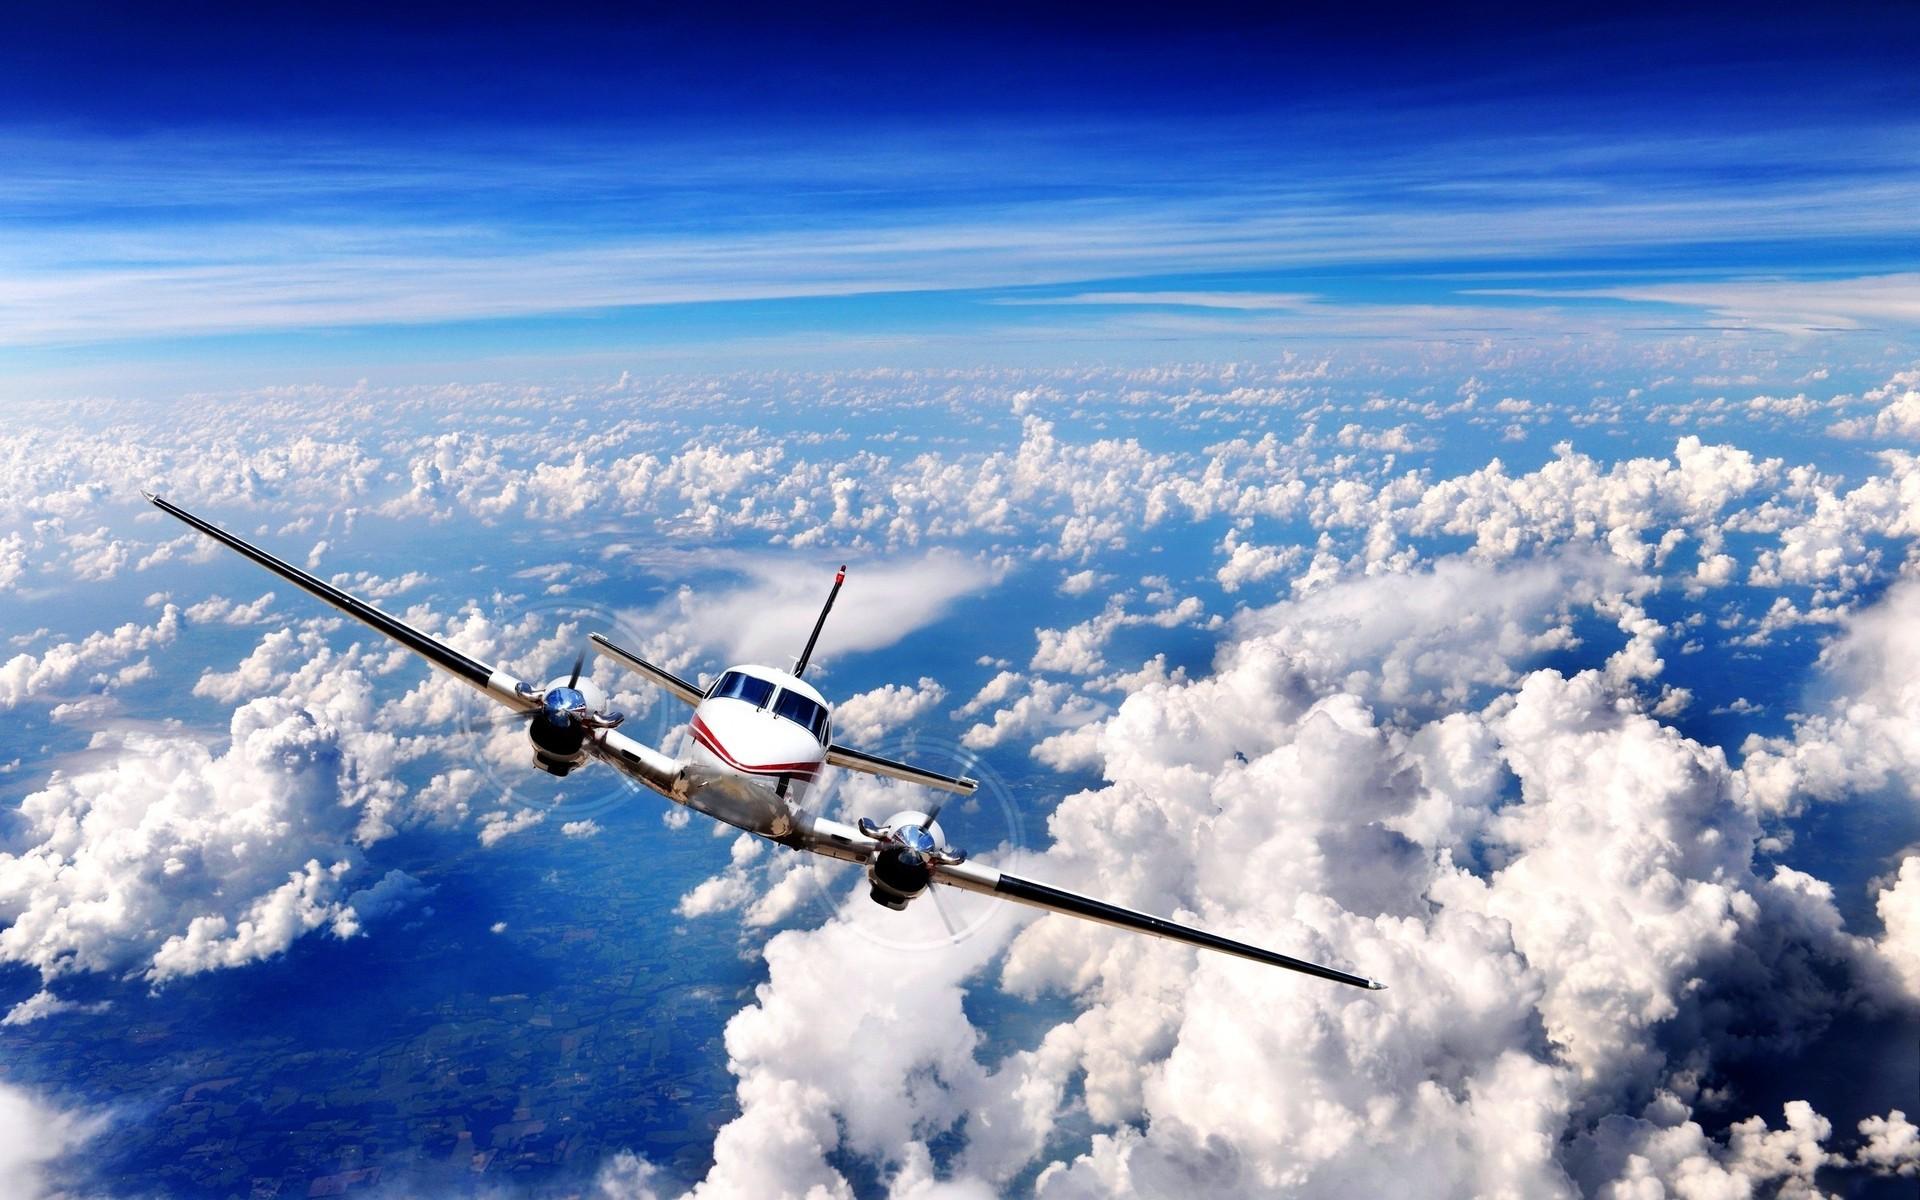 International Aerodynamics and Fluid Mechanics Congress